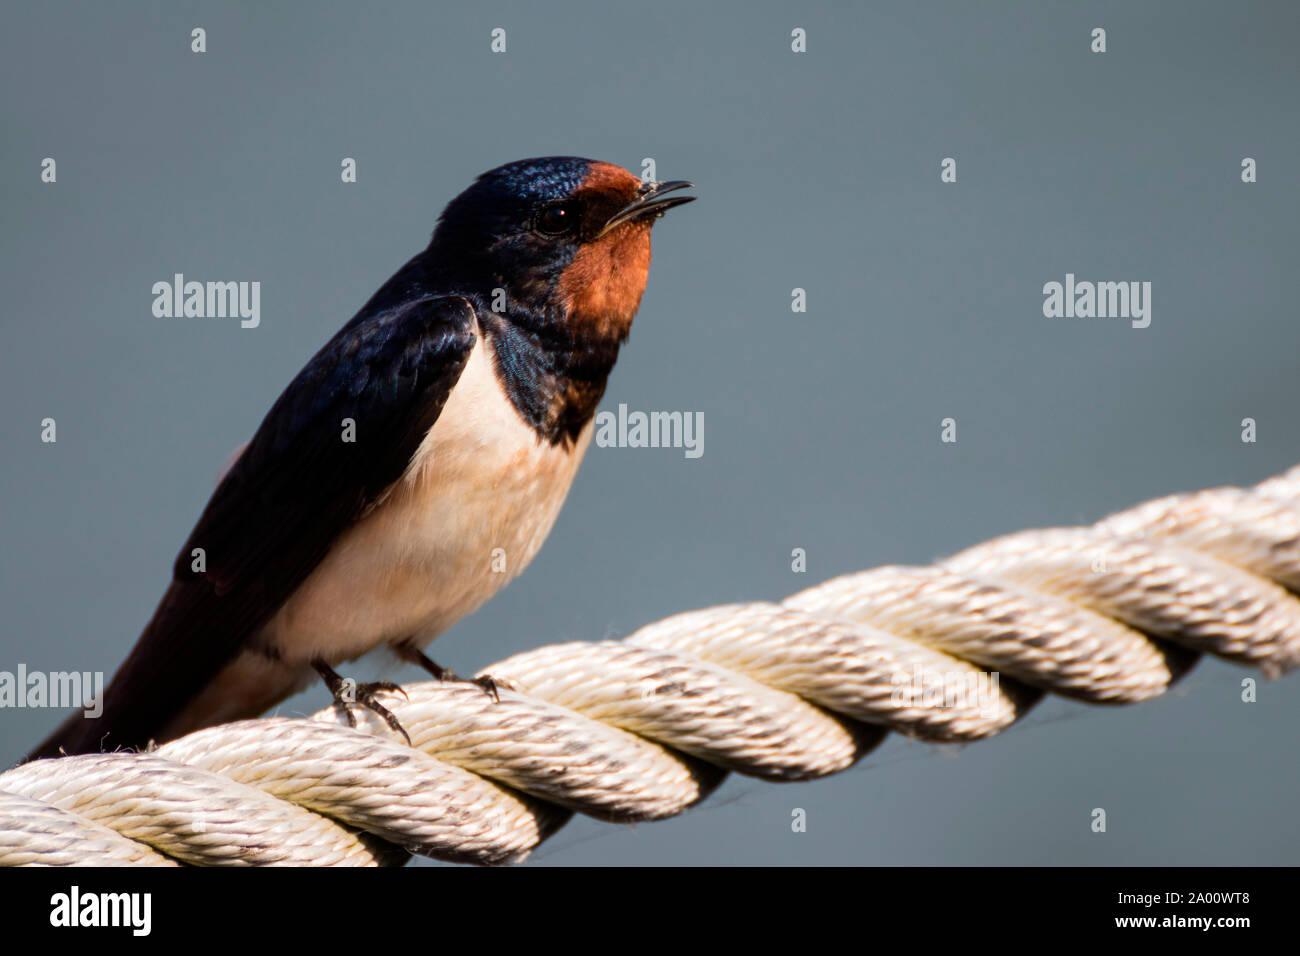 Barn swallow, Zingst, Mecklenburg-Vorpommern, Germany, (Hirundo rustica) Stock Photo